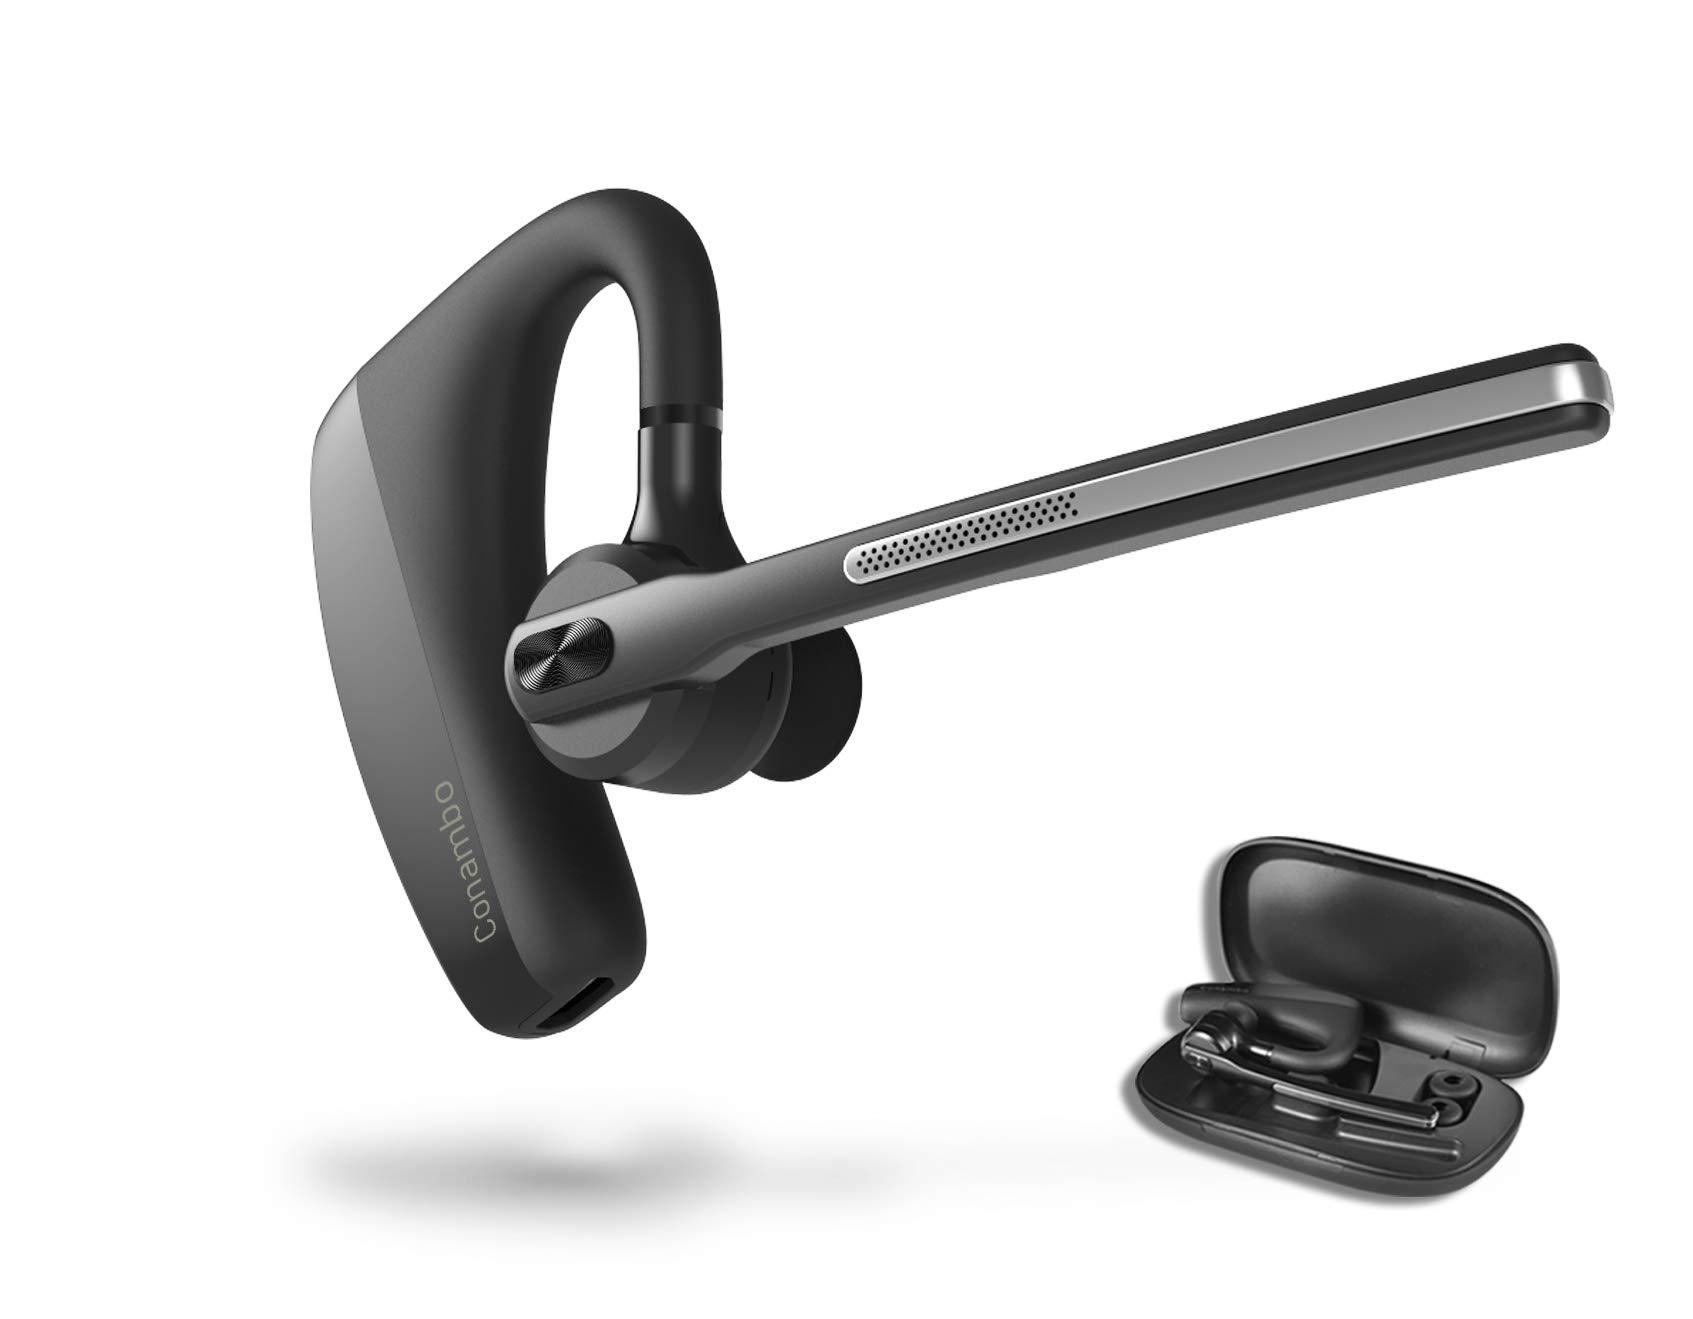 Bluetooth Headset 5.0, aptX HD 16 Hrs Talktime Bluetooth Earpiece, Noise Cancelling Wireless Earphones for Cell Phones Business Trucker by Conambo